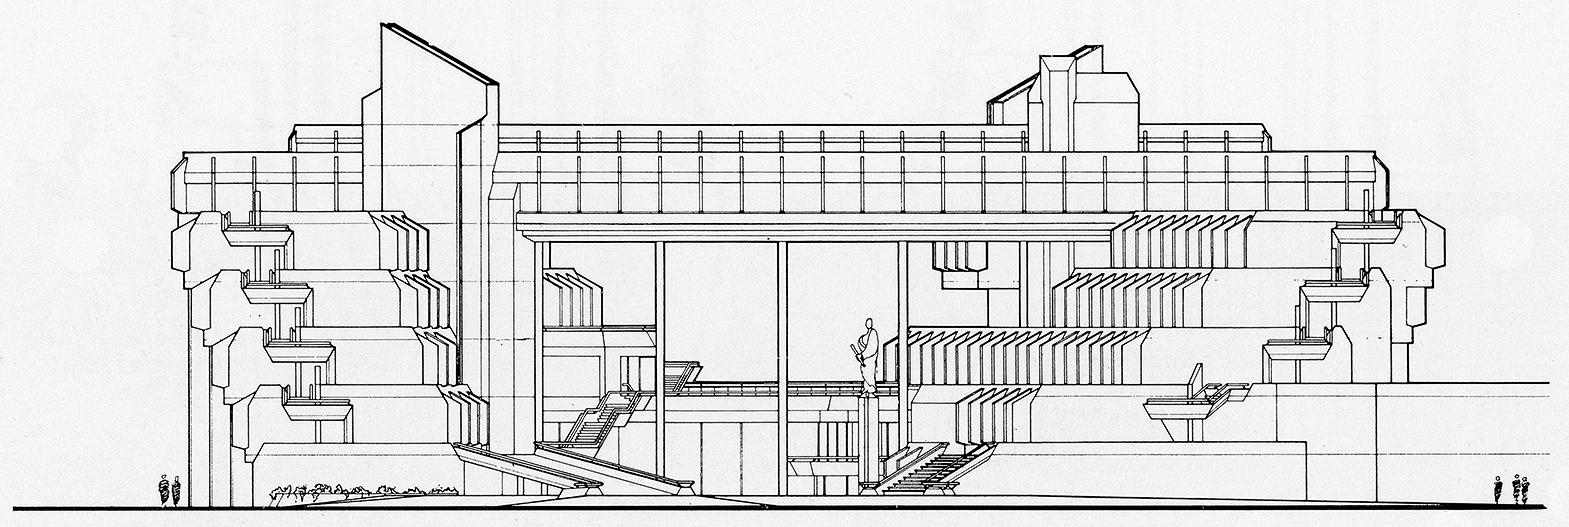 Syracuse City Hall, Syracuse, New York.  Building Elevation.